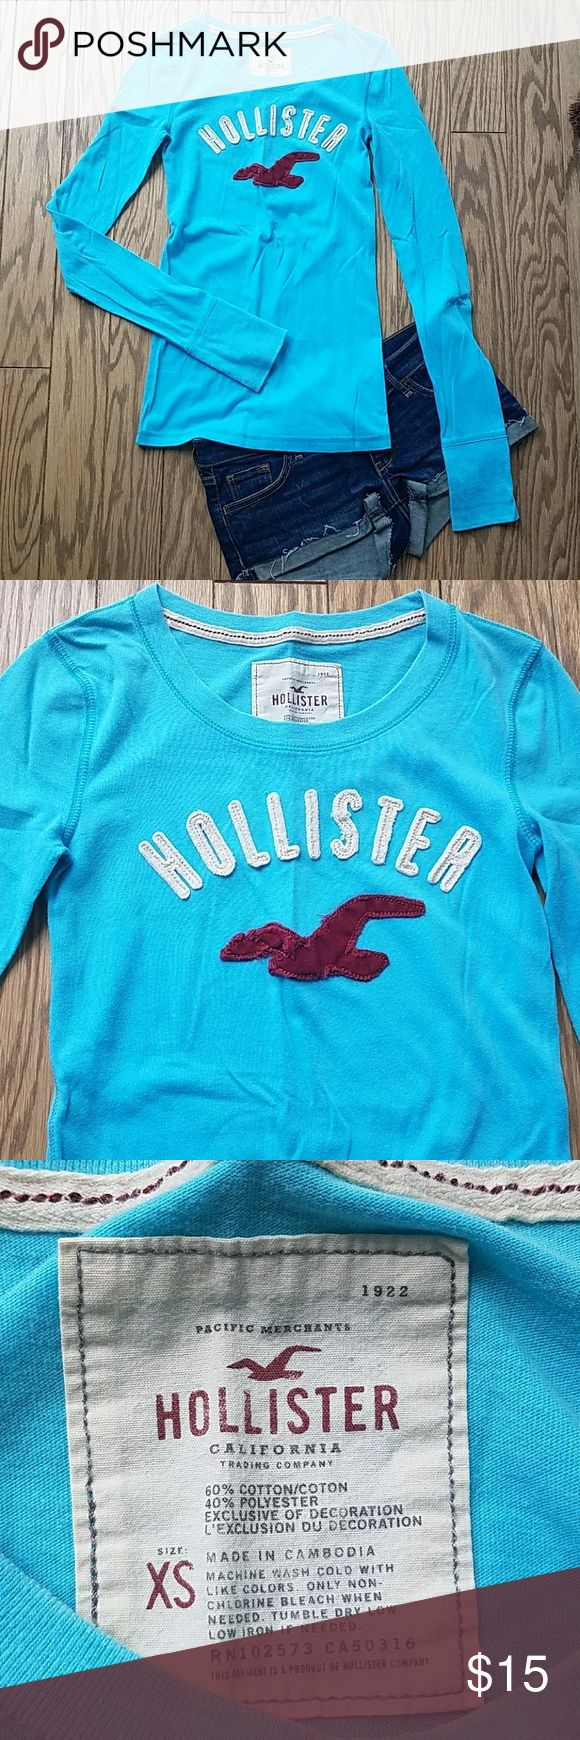 Hollister long sleeve Long sleeve Hollister shirt. New but no tags, never worn. Hollister Tops Tees - Long Sleeve